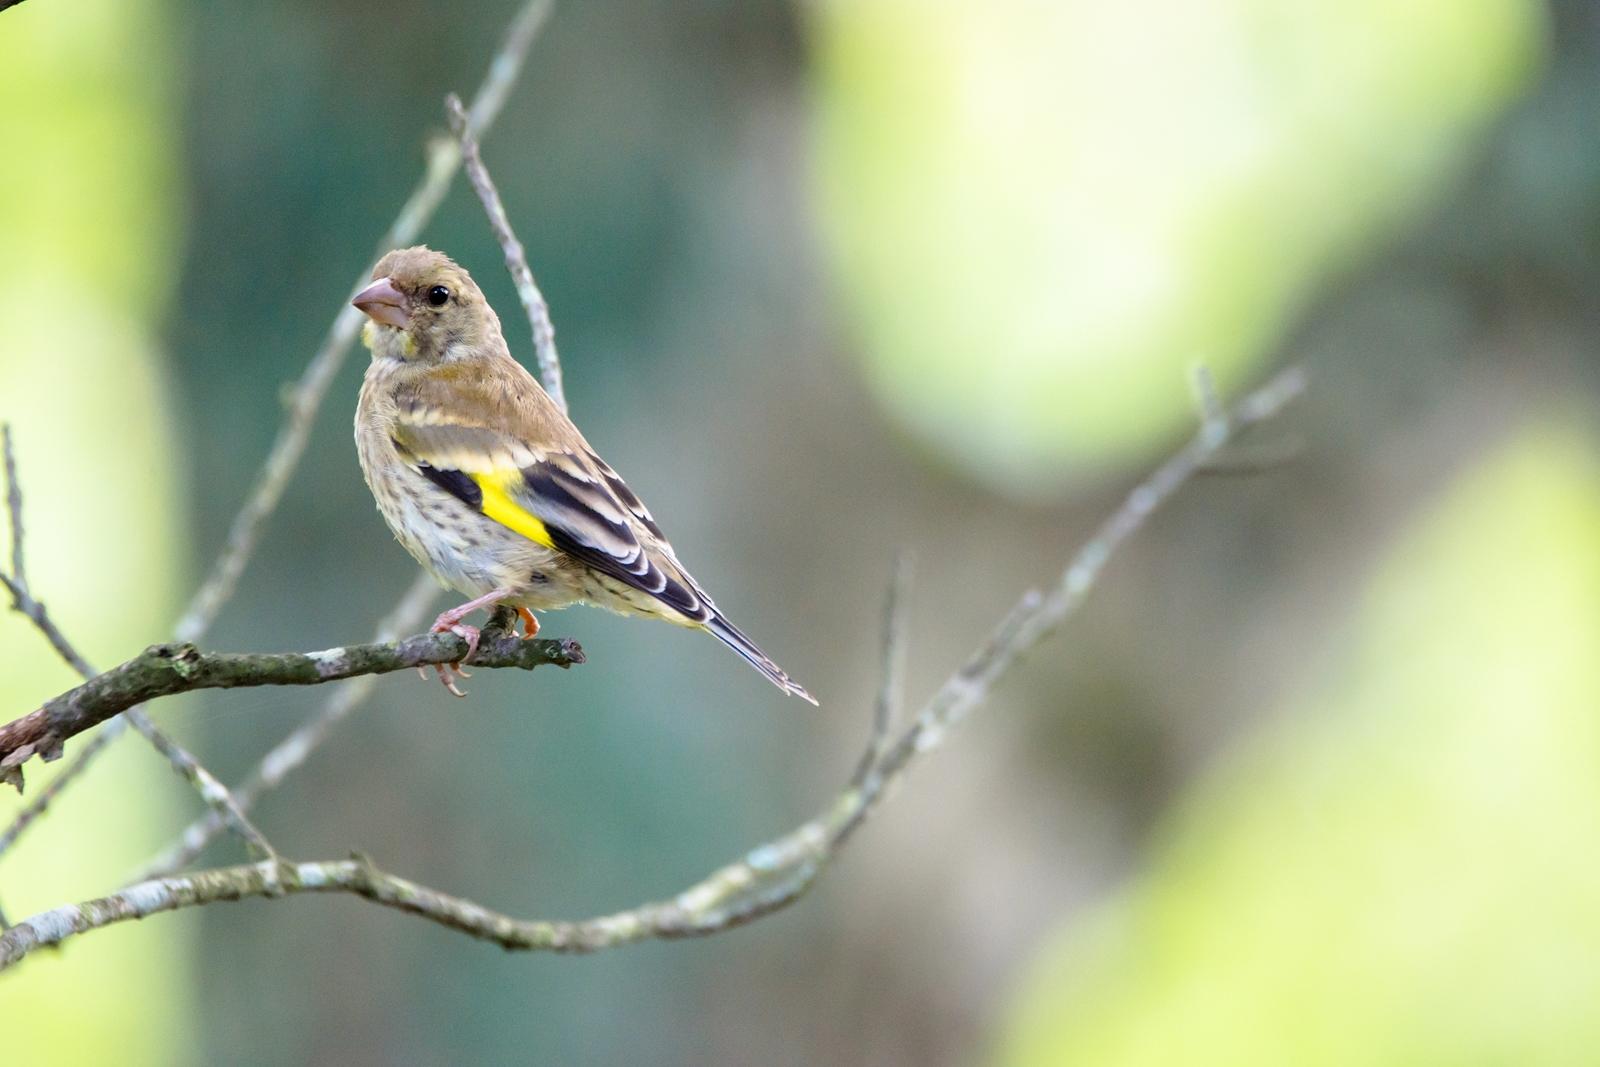 Photo: ちらり Look back.  どこへ行くの? 早朝の森で 鳥たちがあっちへこっちへ どうやら 行き先は秘密みたい  Oriental Greenfinch. (カワラヒワ)  #birdphotography #birds #cooljapan #kawaii #nikon #sigma  Nikon D7200 SIGMA 150-600mm F5-6.3 DG OS HSM Contemporary